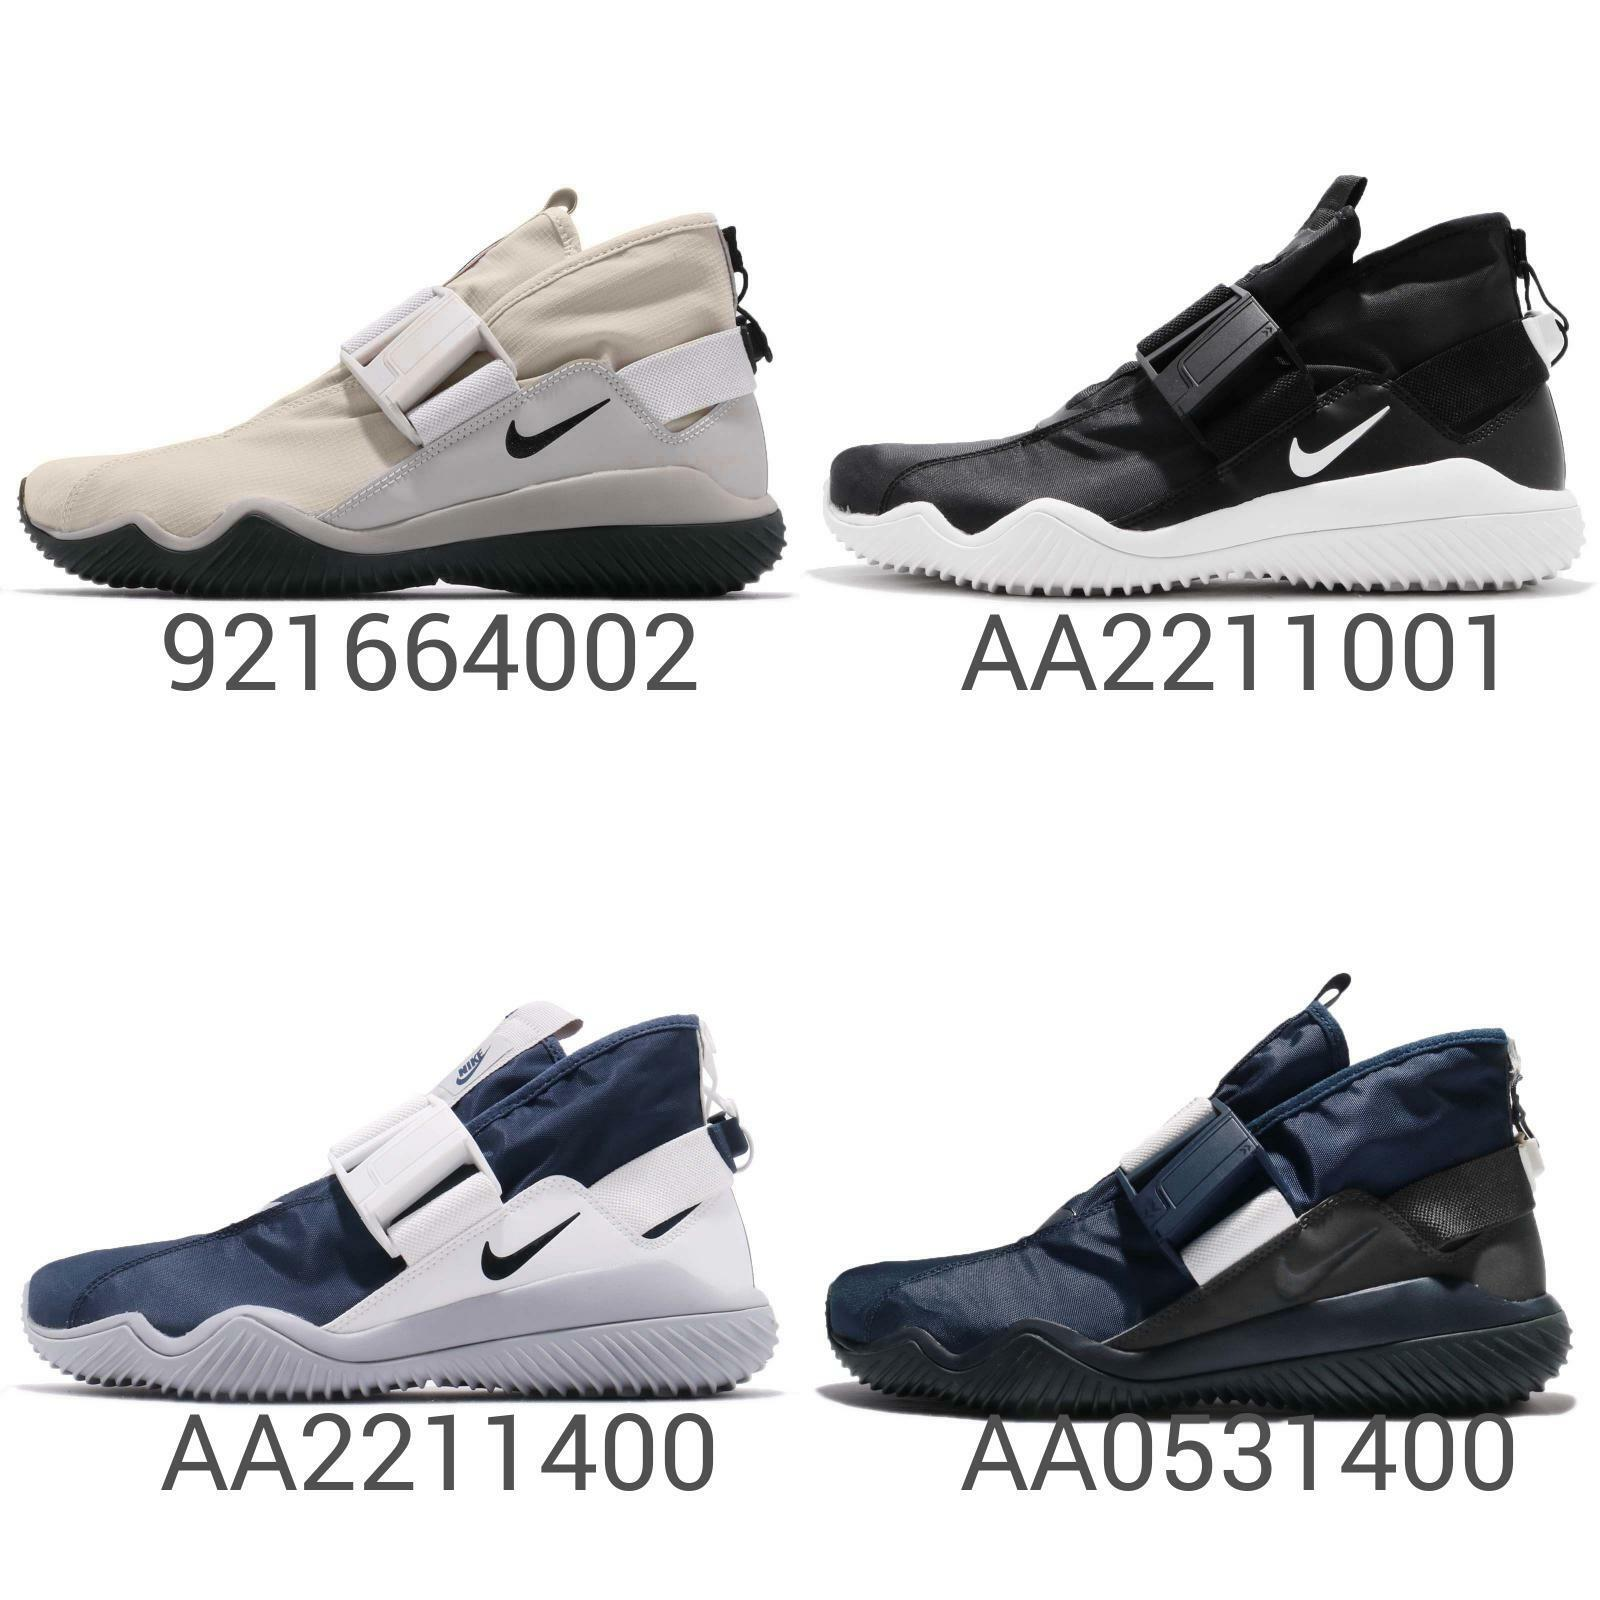 KMTR Komyuter Nike Laceless Sneakers 1 Pick shoes Lifestyle